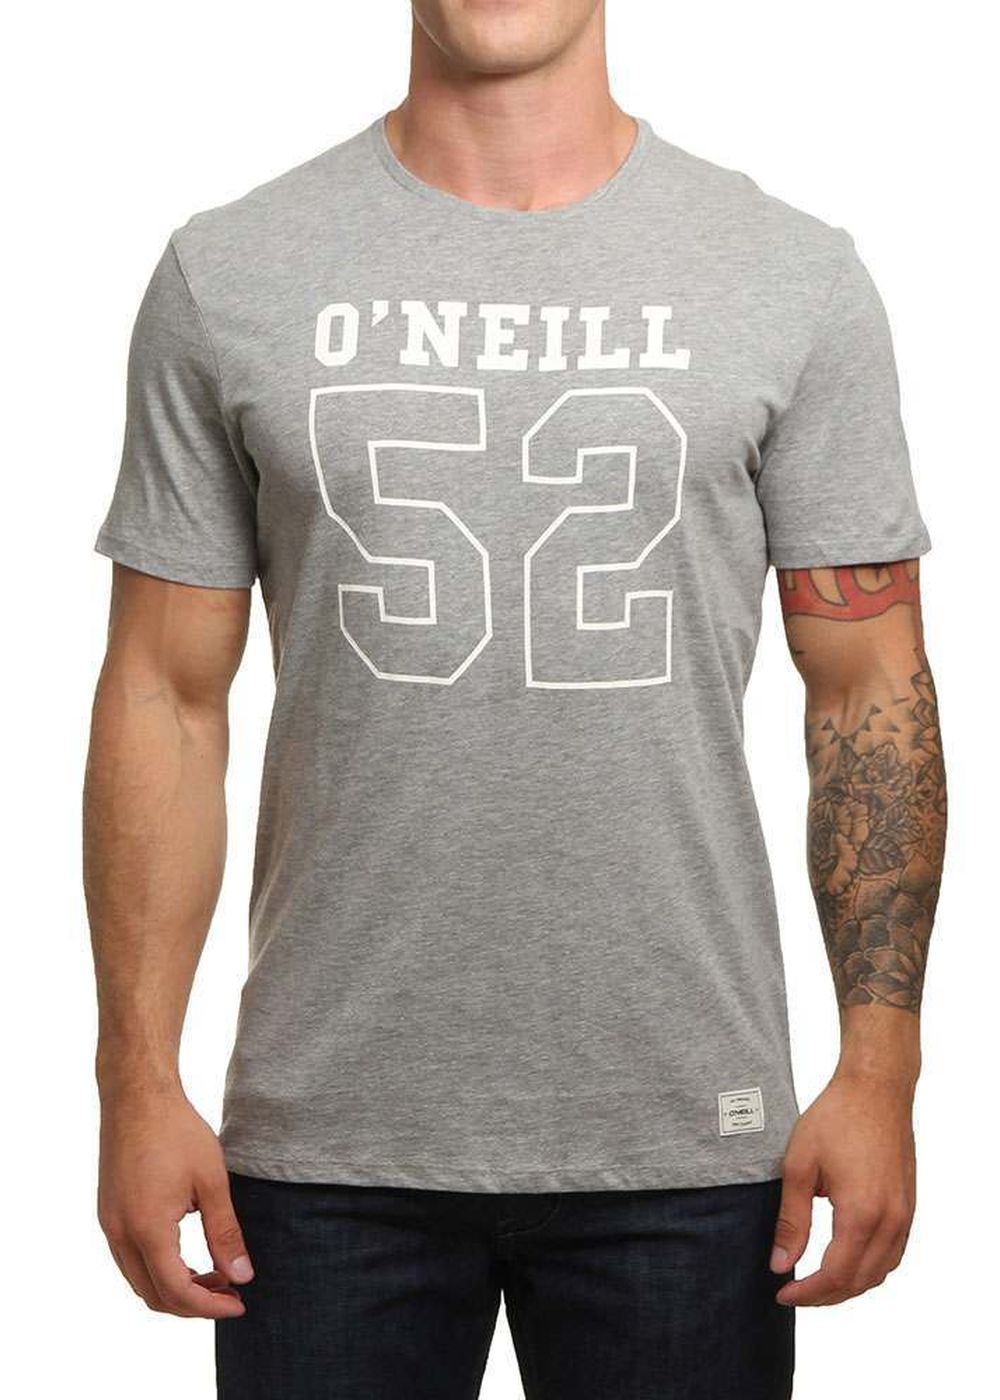 oneill-52-tee-silver-melee